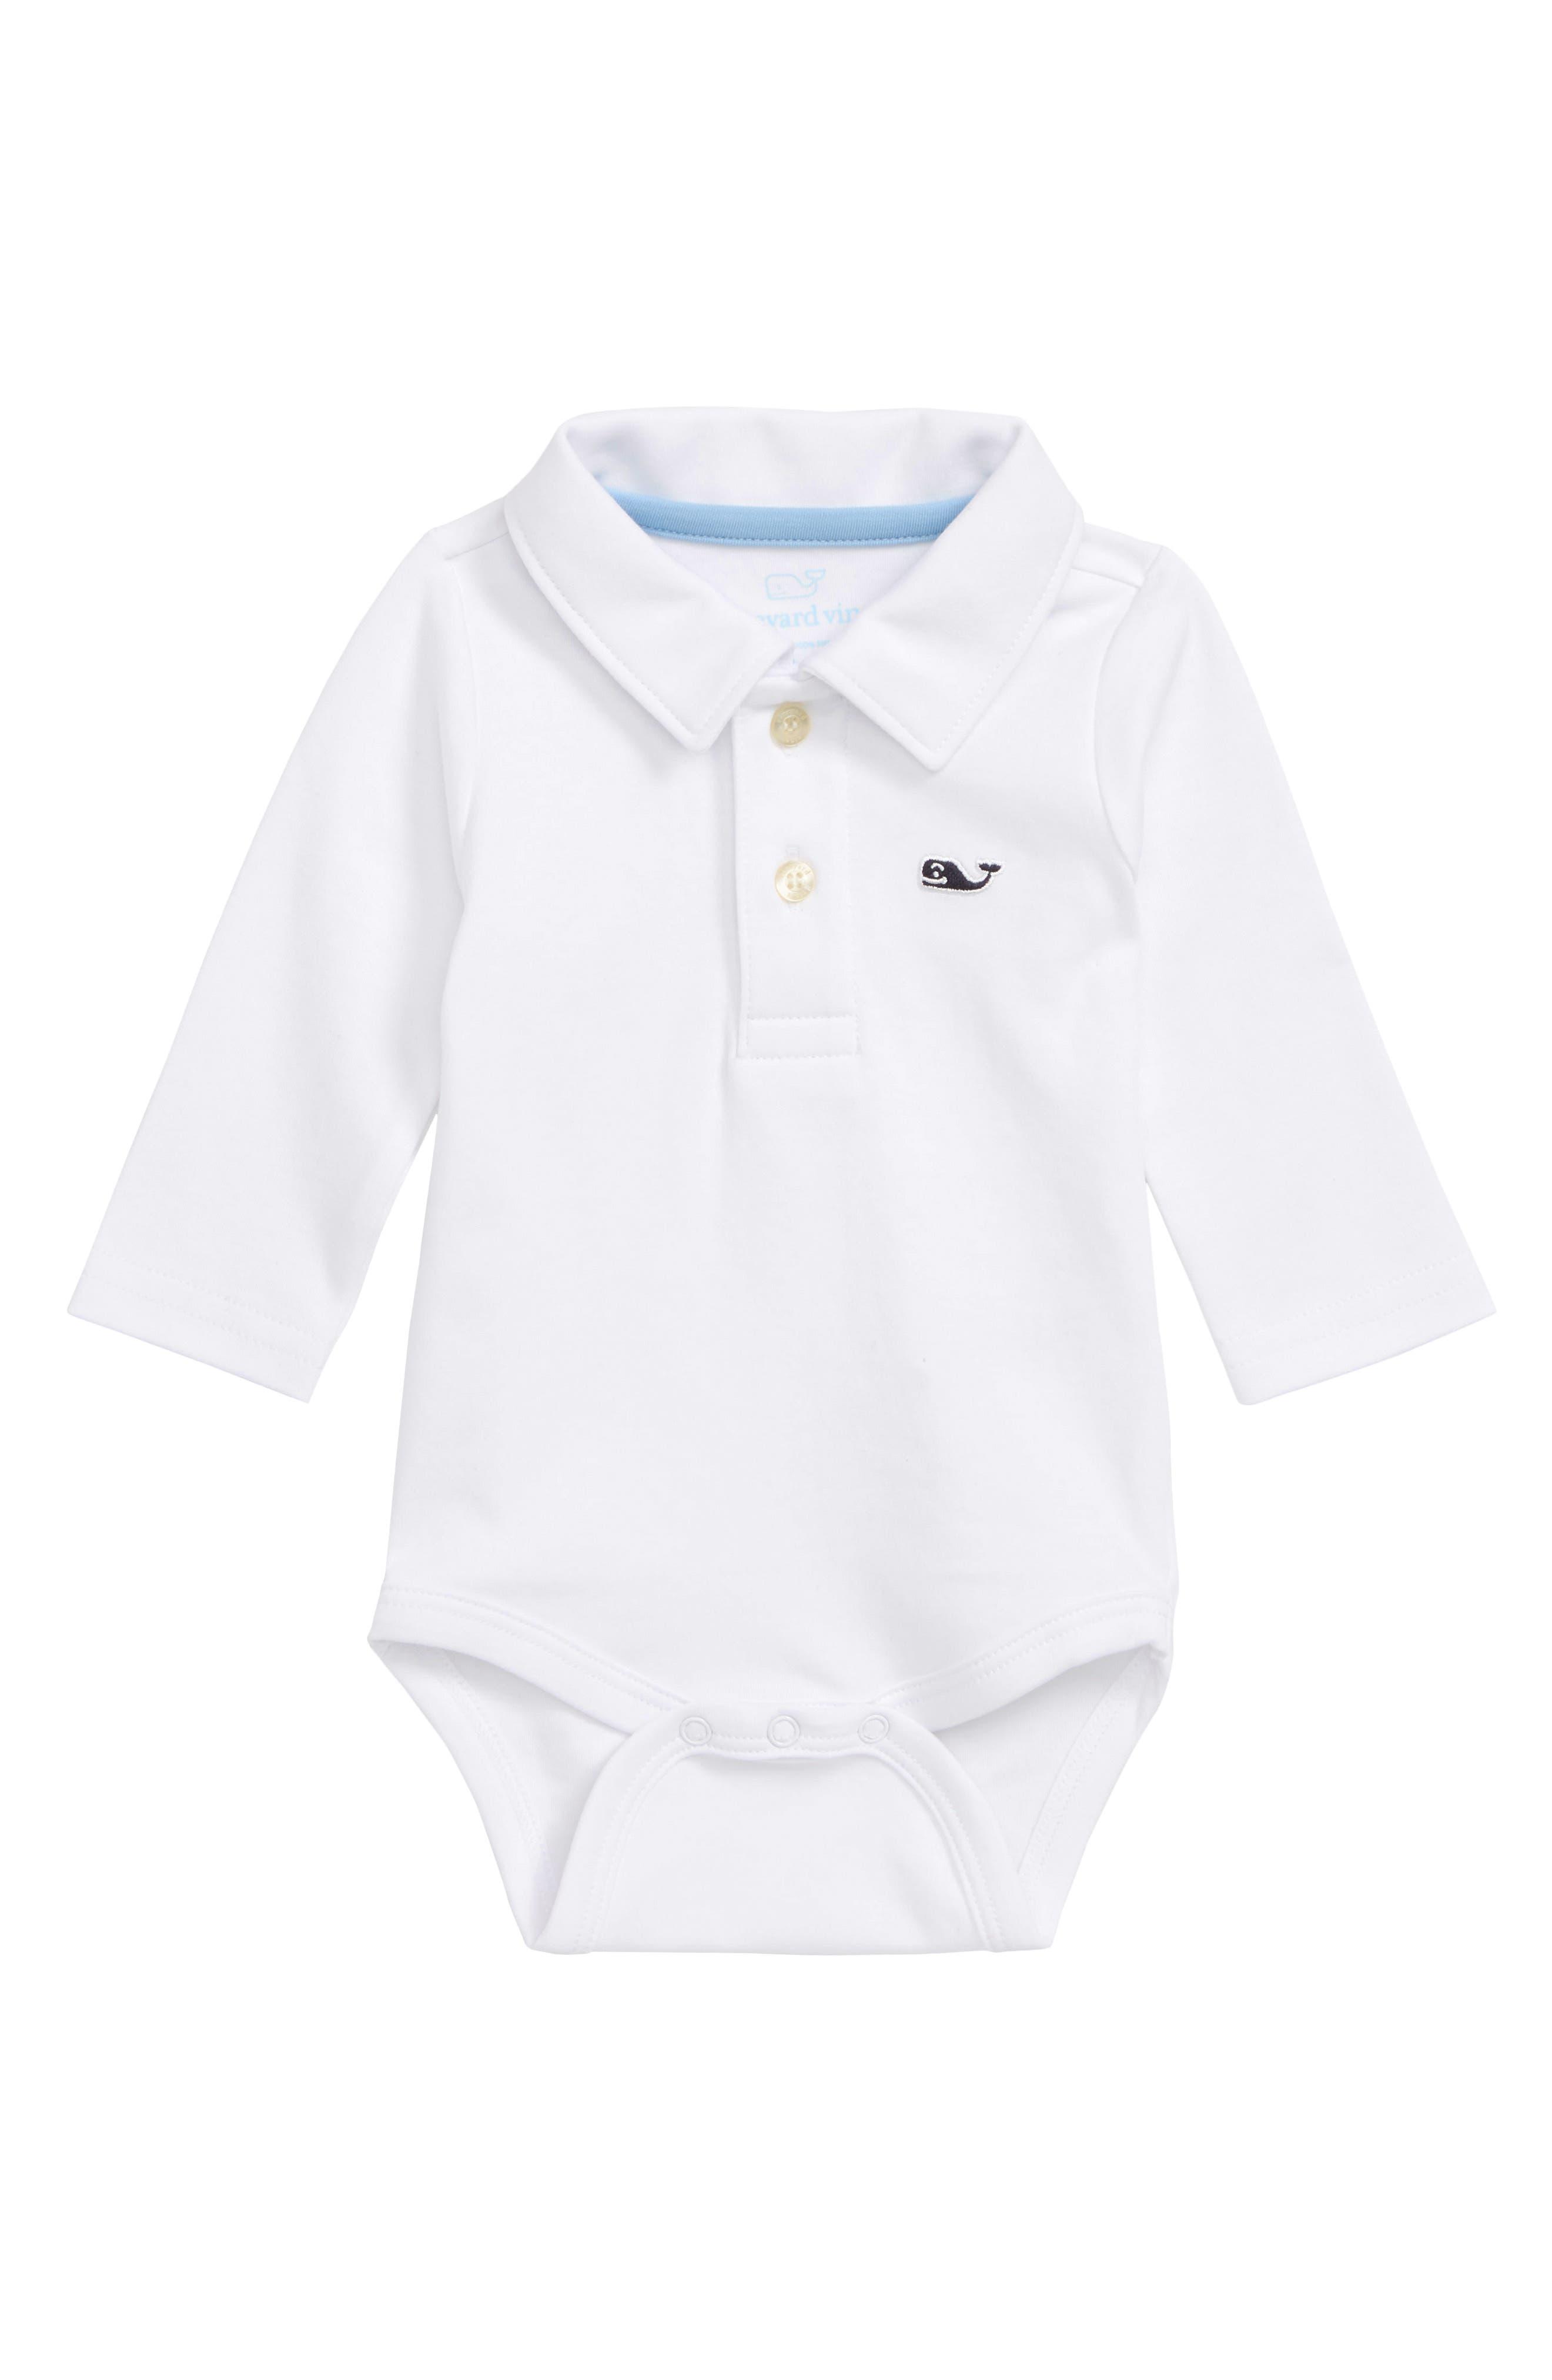 Infant Boys Vineyard Vines Polo Bodysuit Size 1824M  White